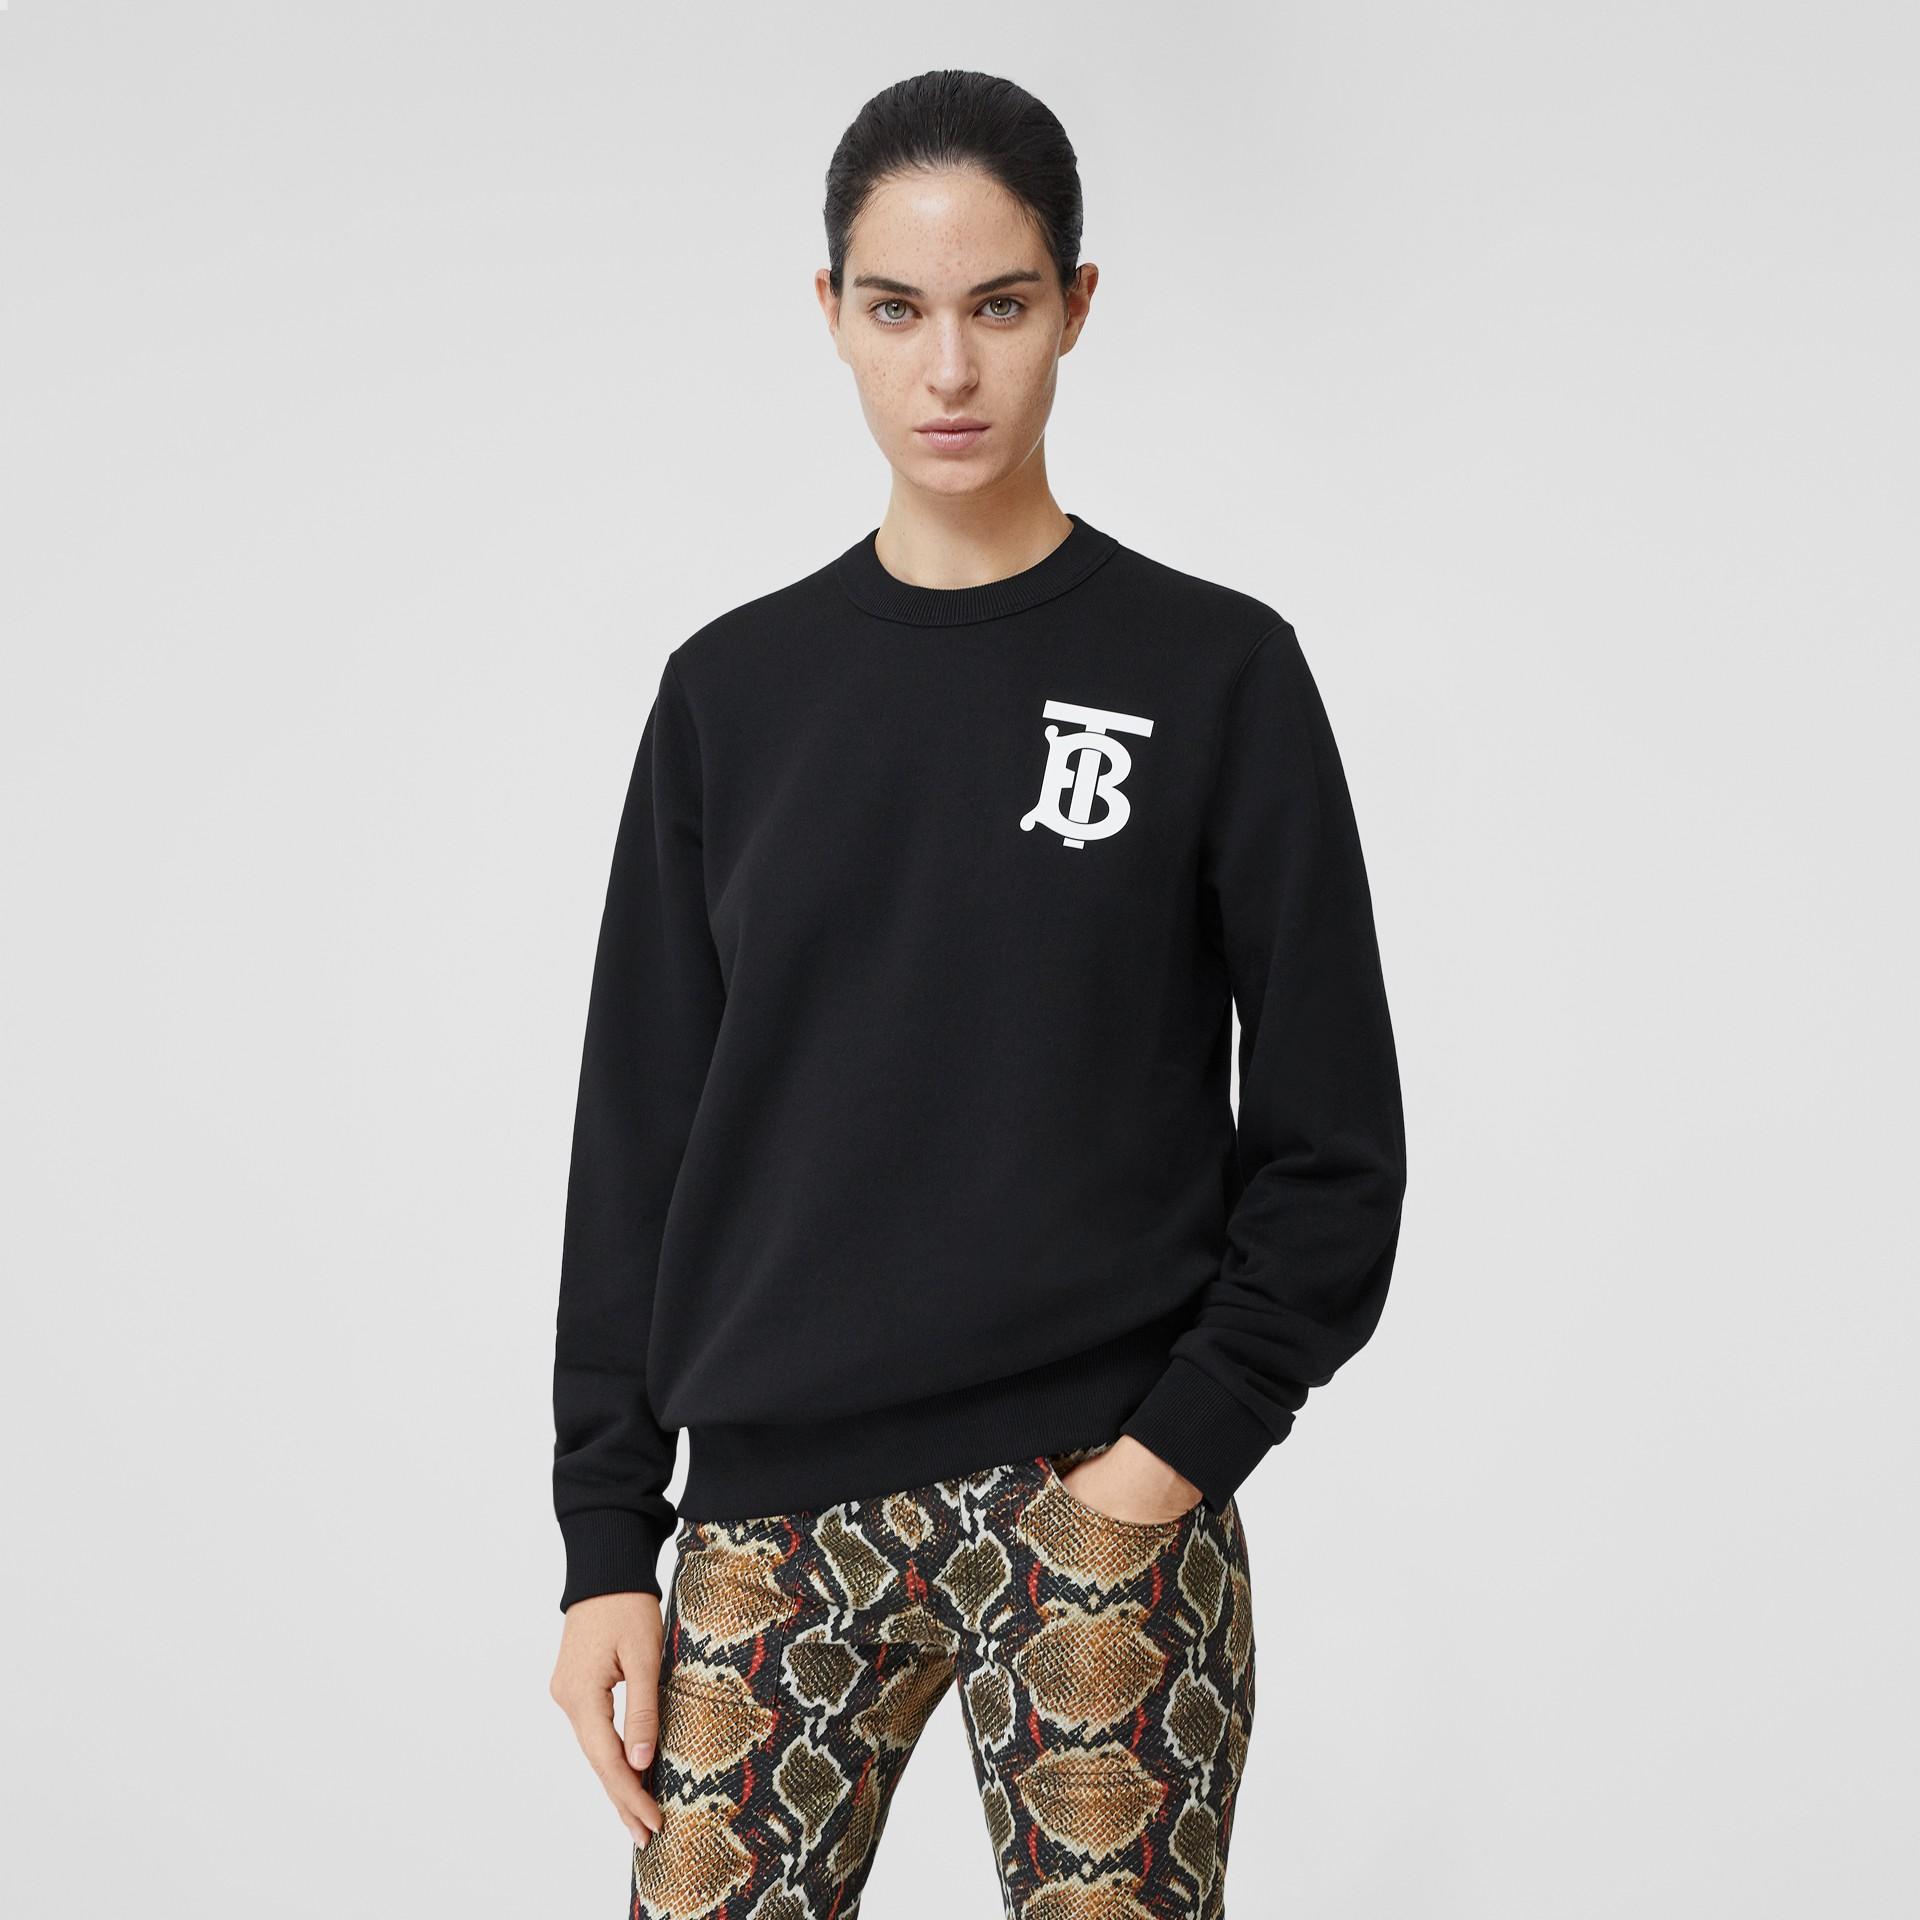 Monogram Motif Cotton Sweatshirt in Black - Women | Burberry United States - gallery image 0